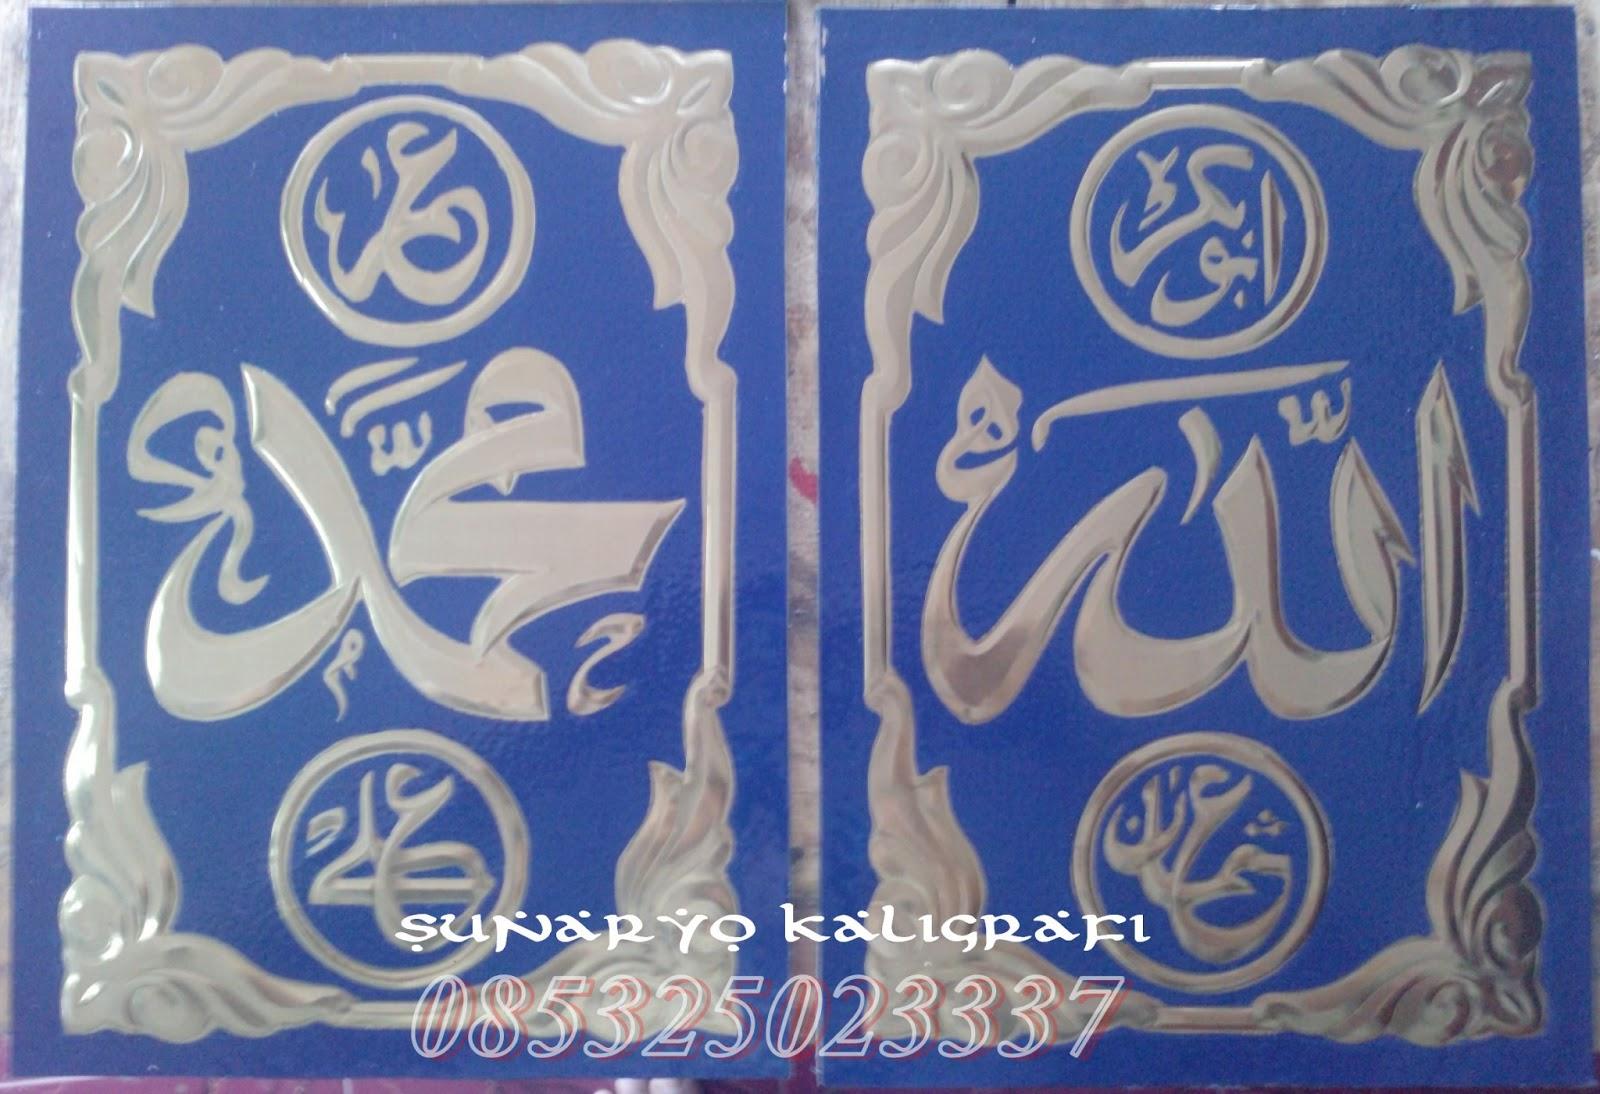 Kaligrafi Muhammadjpg Car Interior Design Gambar Kaligrafi Arab